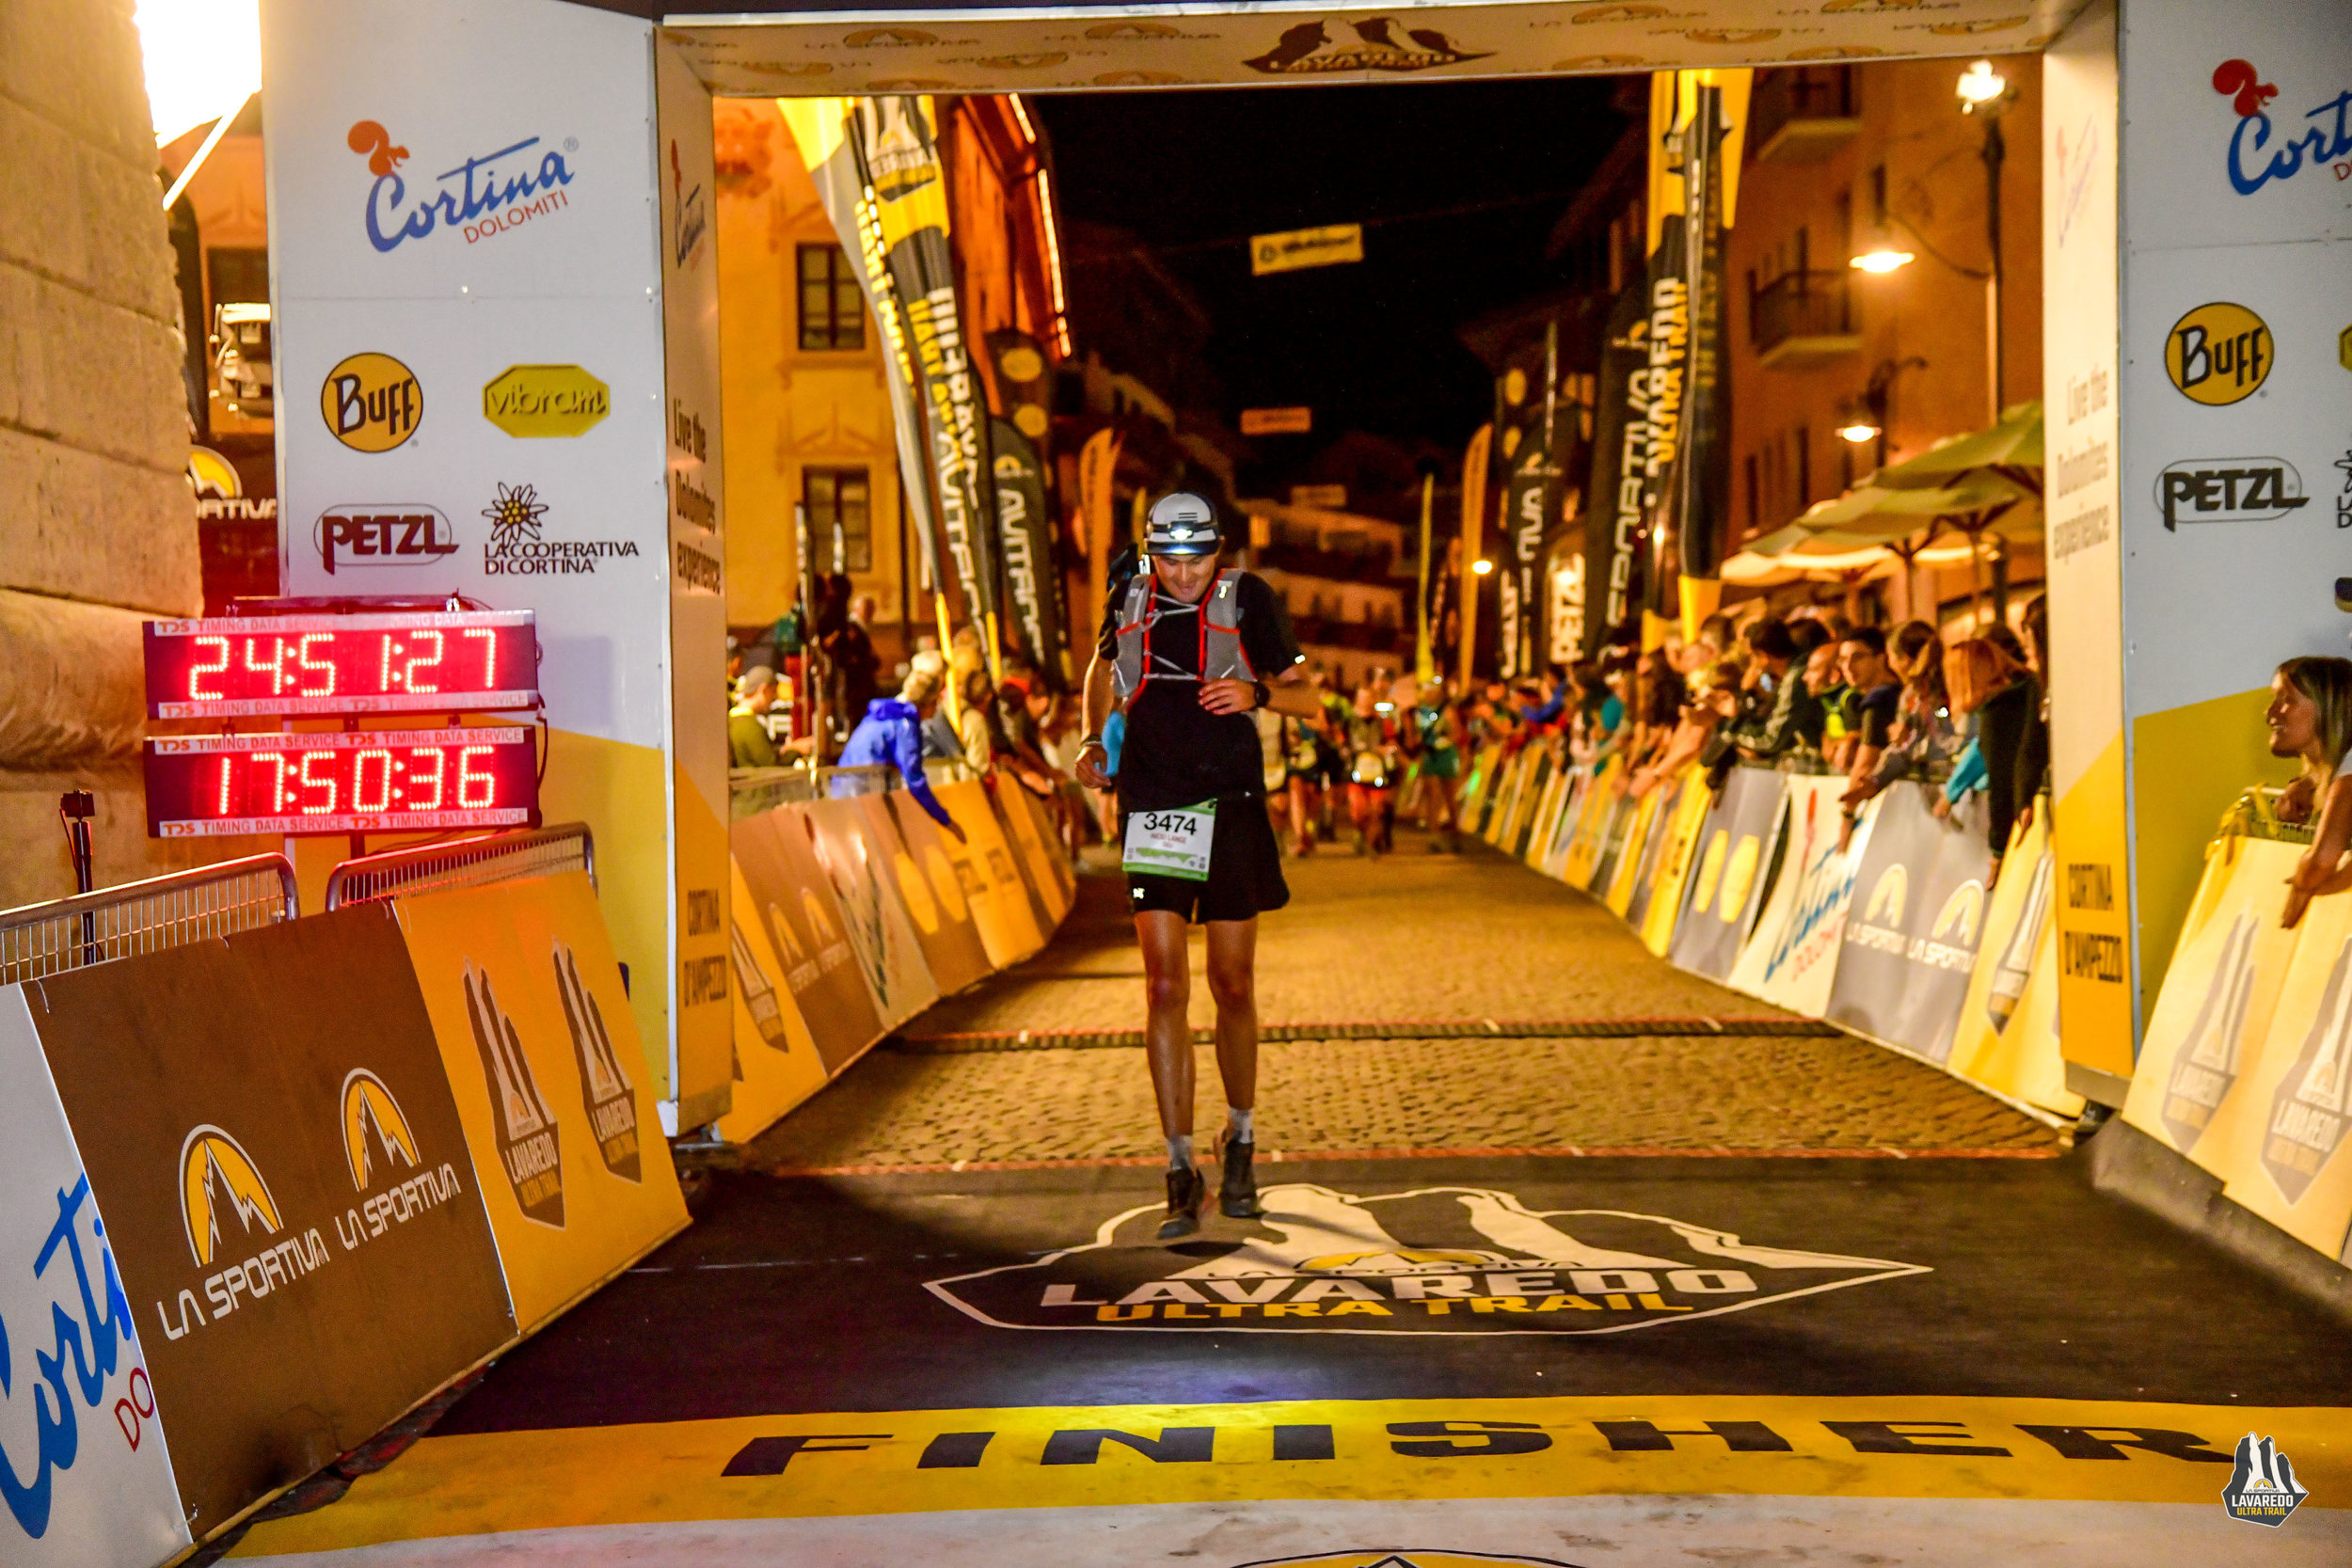 La-Sportiva-Lavaredo-Ultra-Trail-Ultra-Dolomites-2019-8.jpg